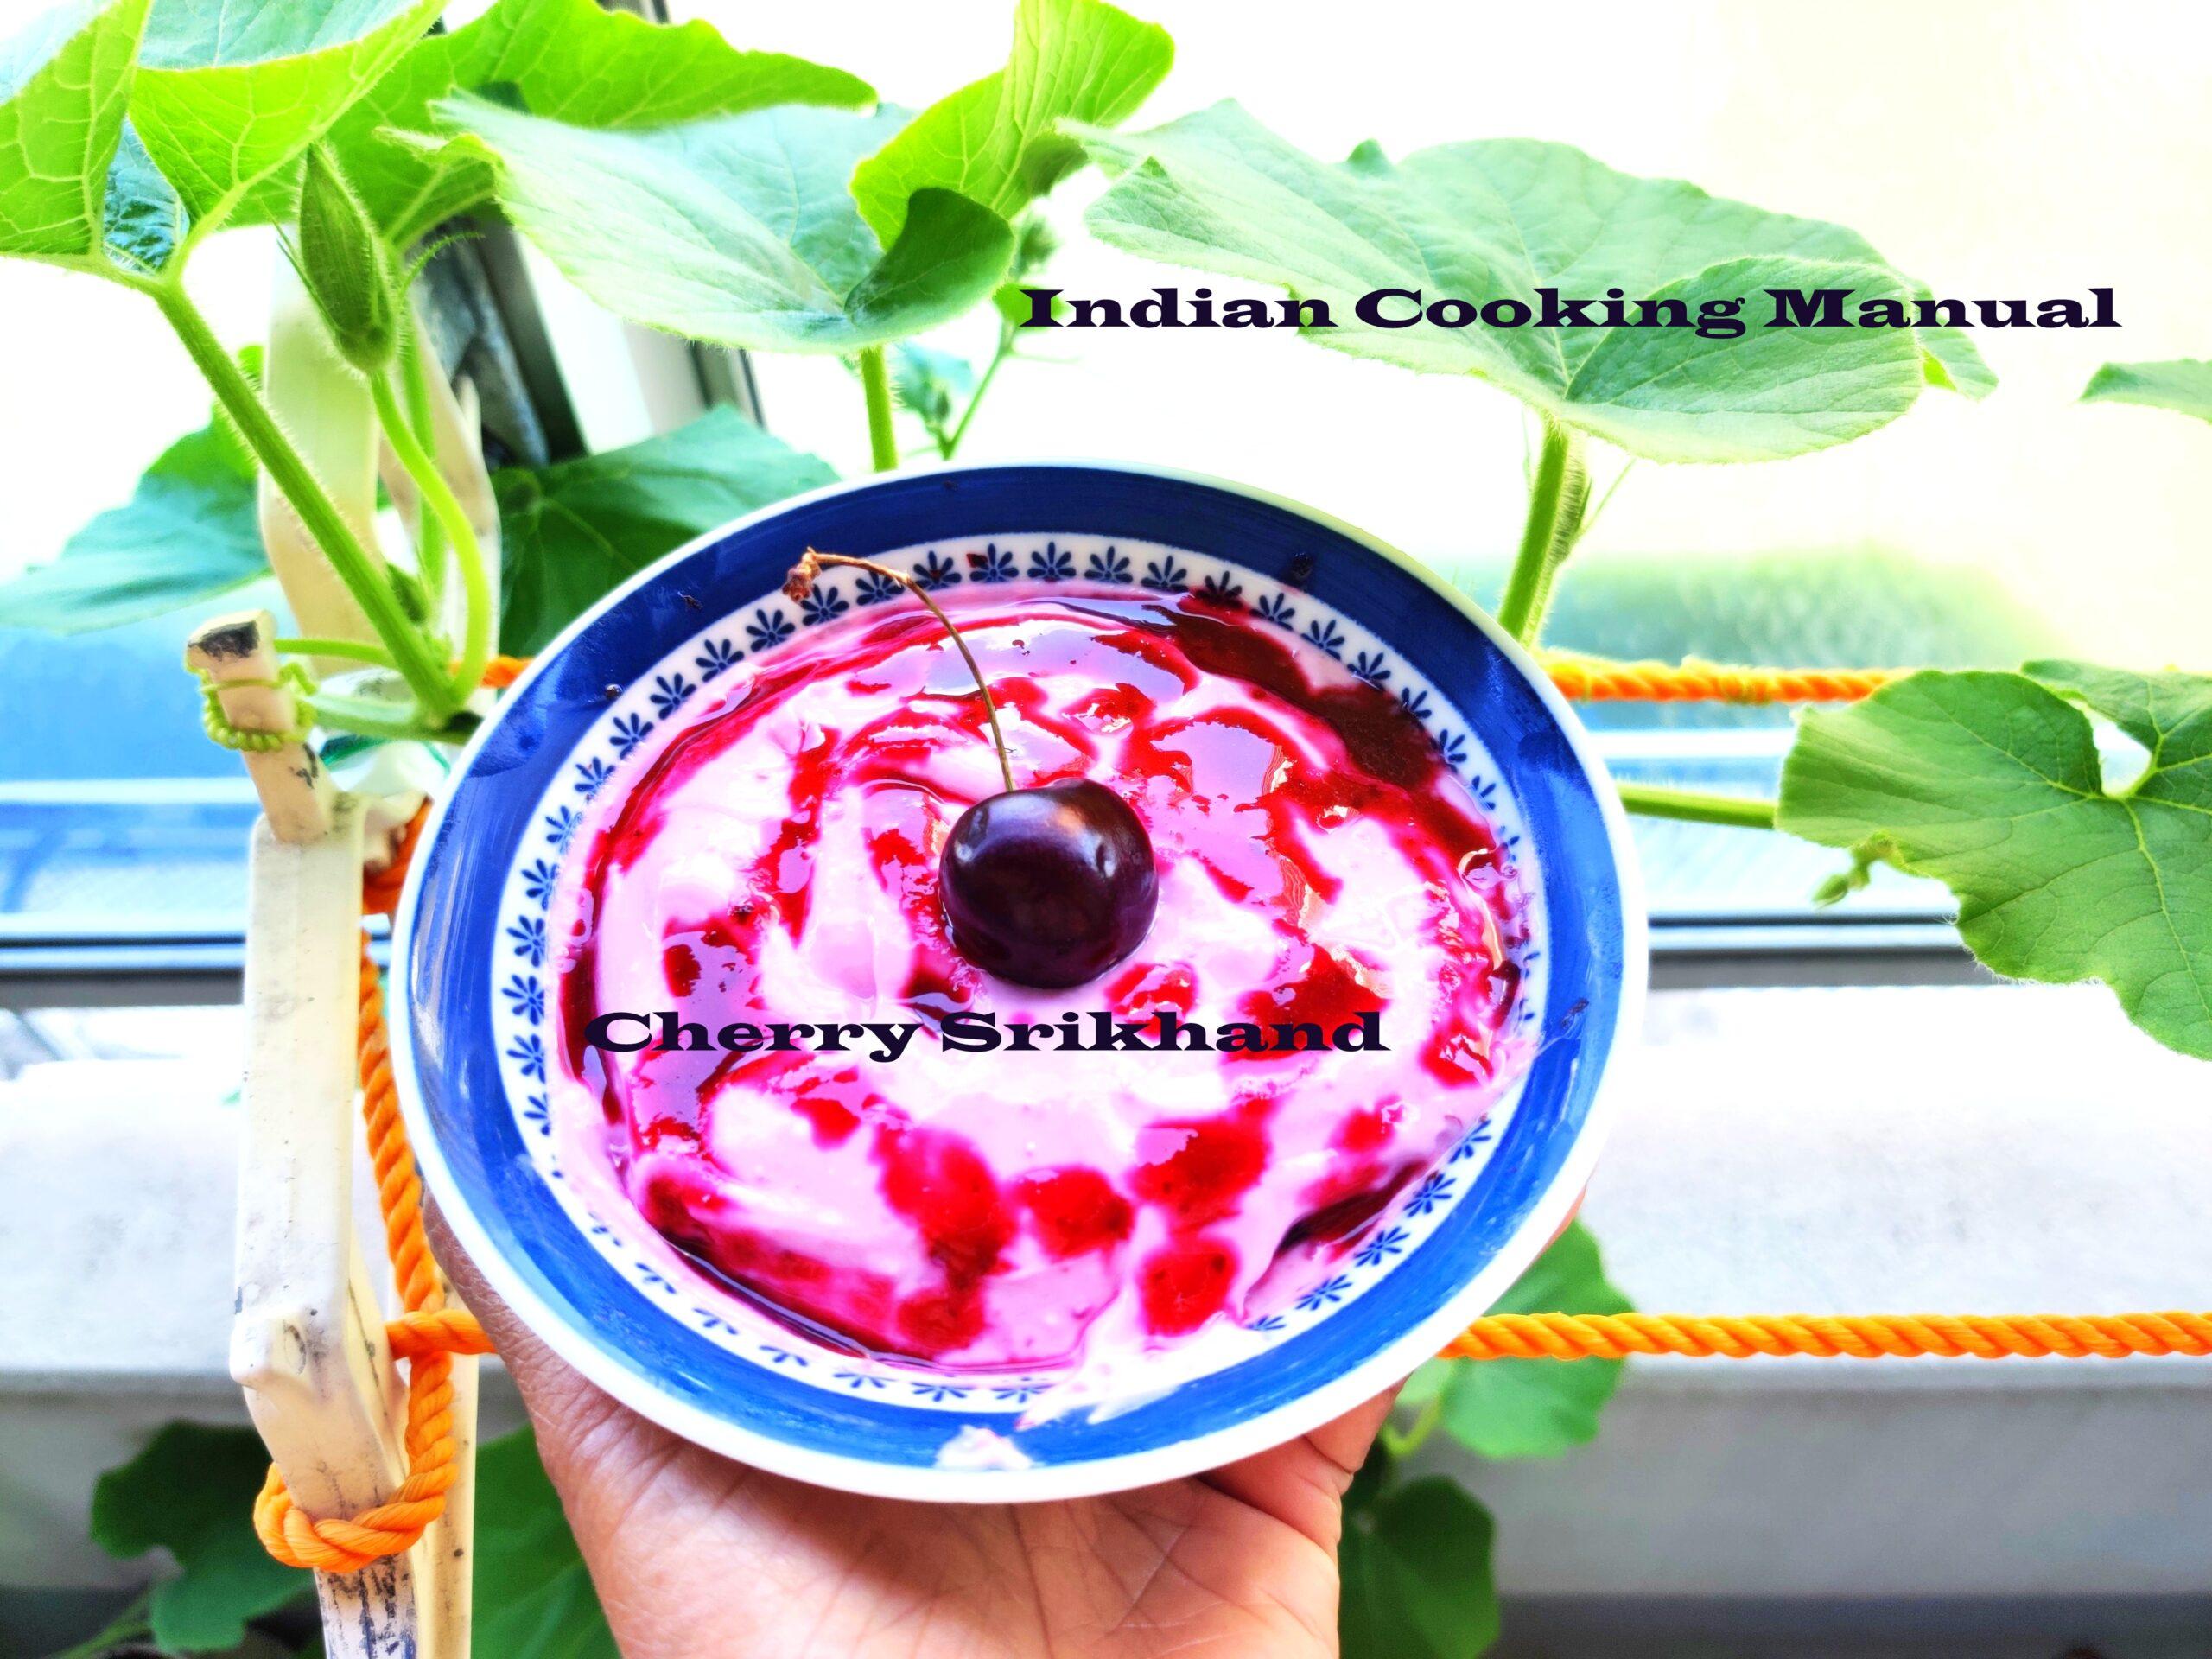 Cherry Srikhand